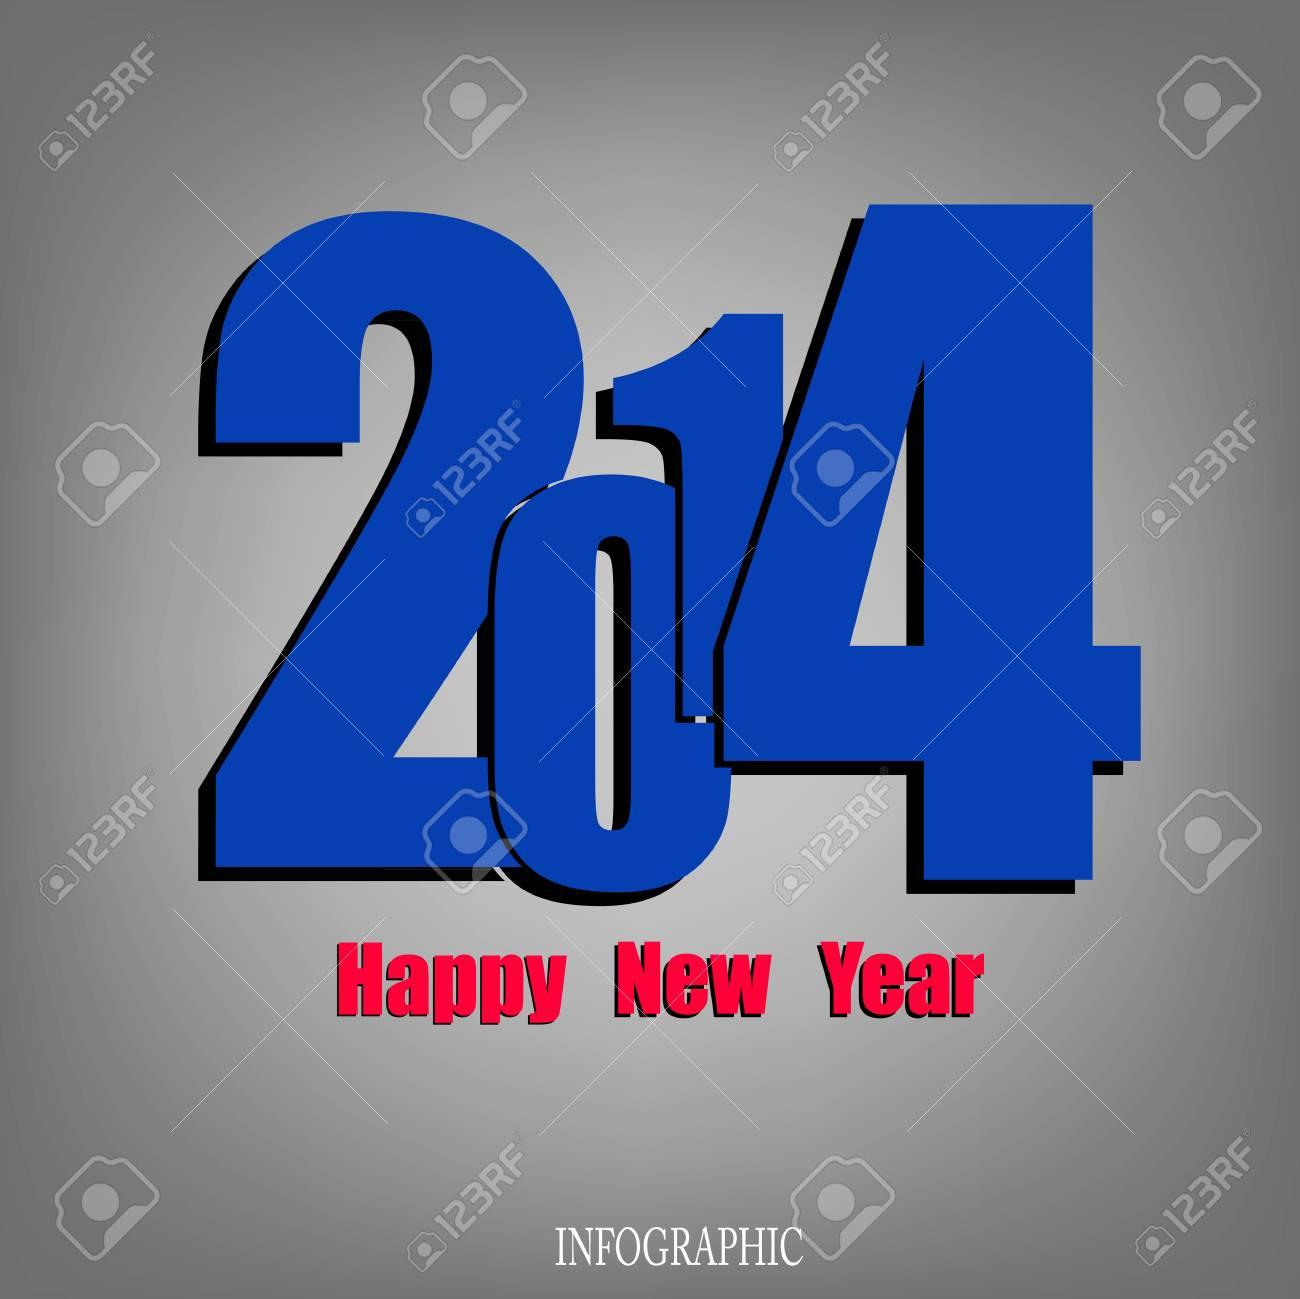 Creative Happy New Year 2014 Infographic Calendars Vector Stock Vector - 22951383